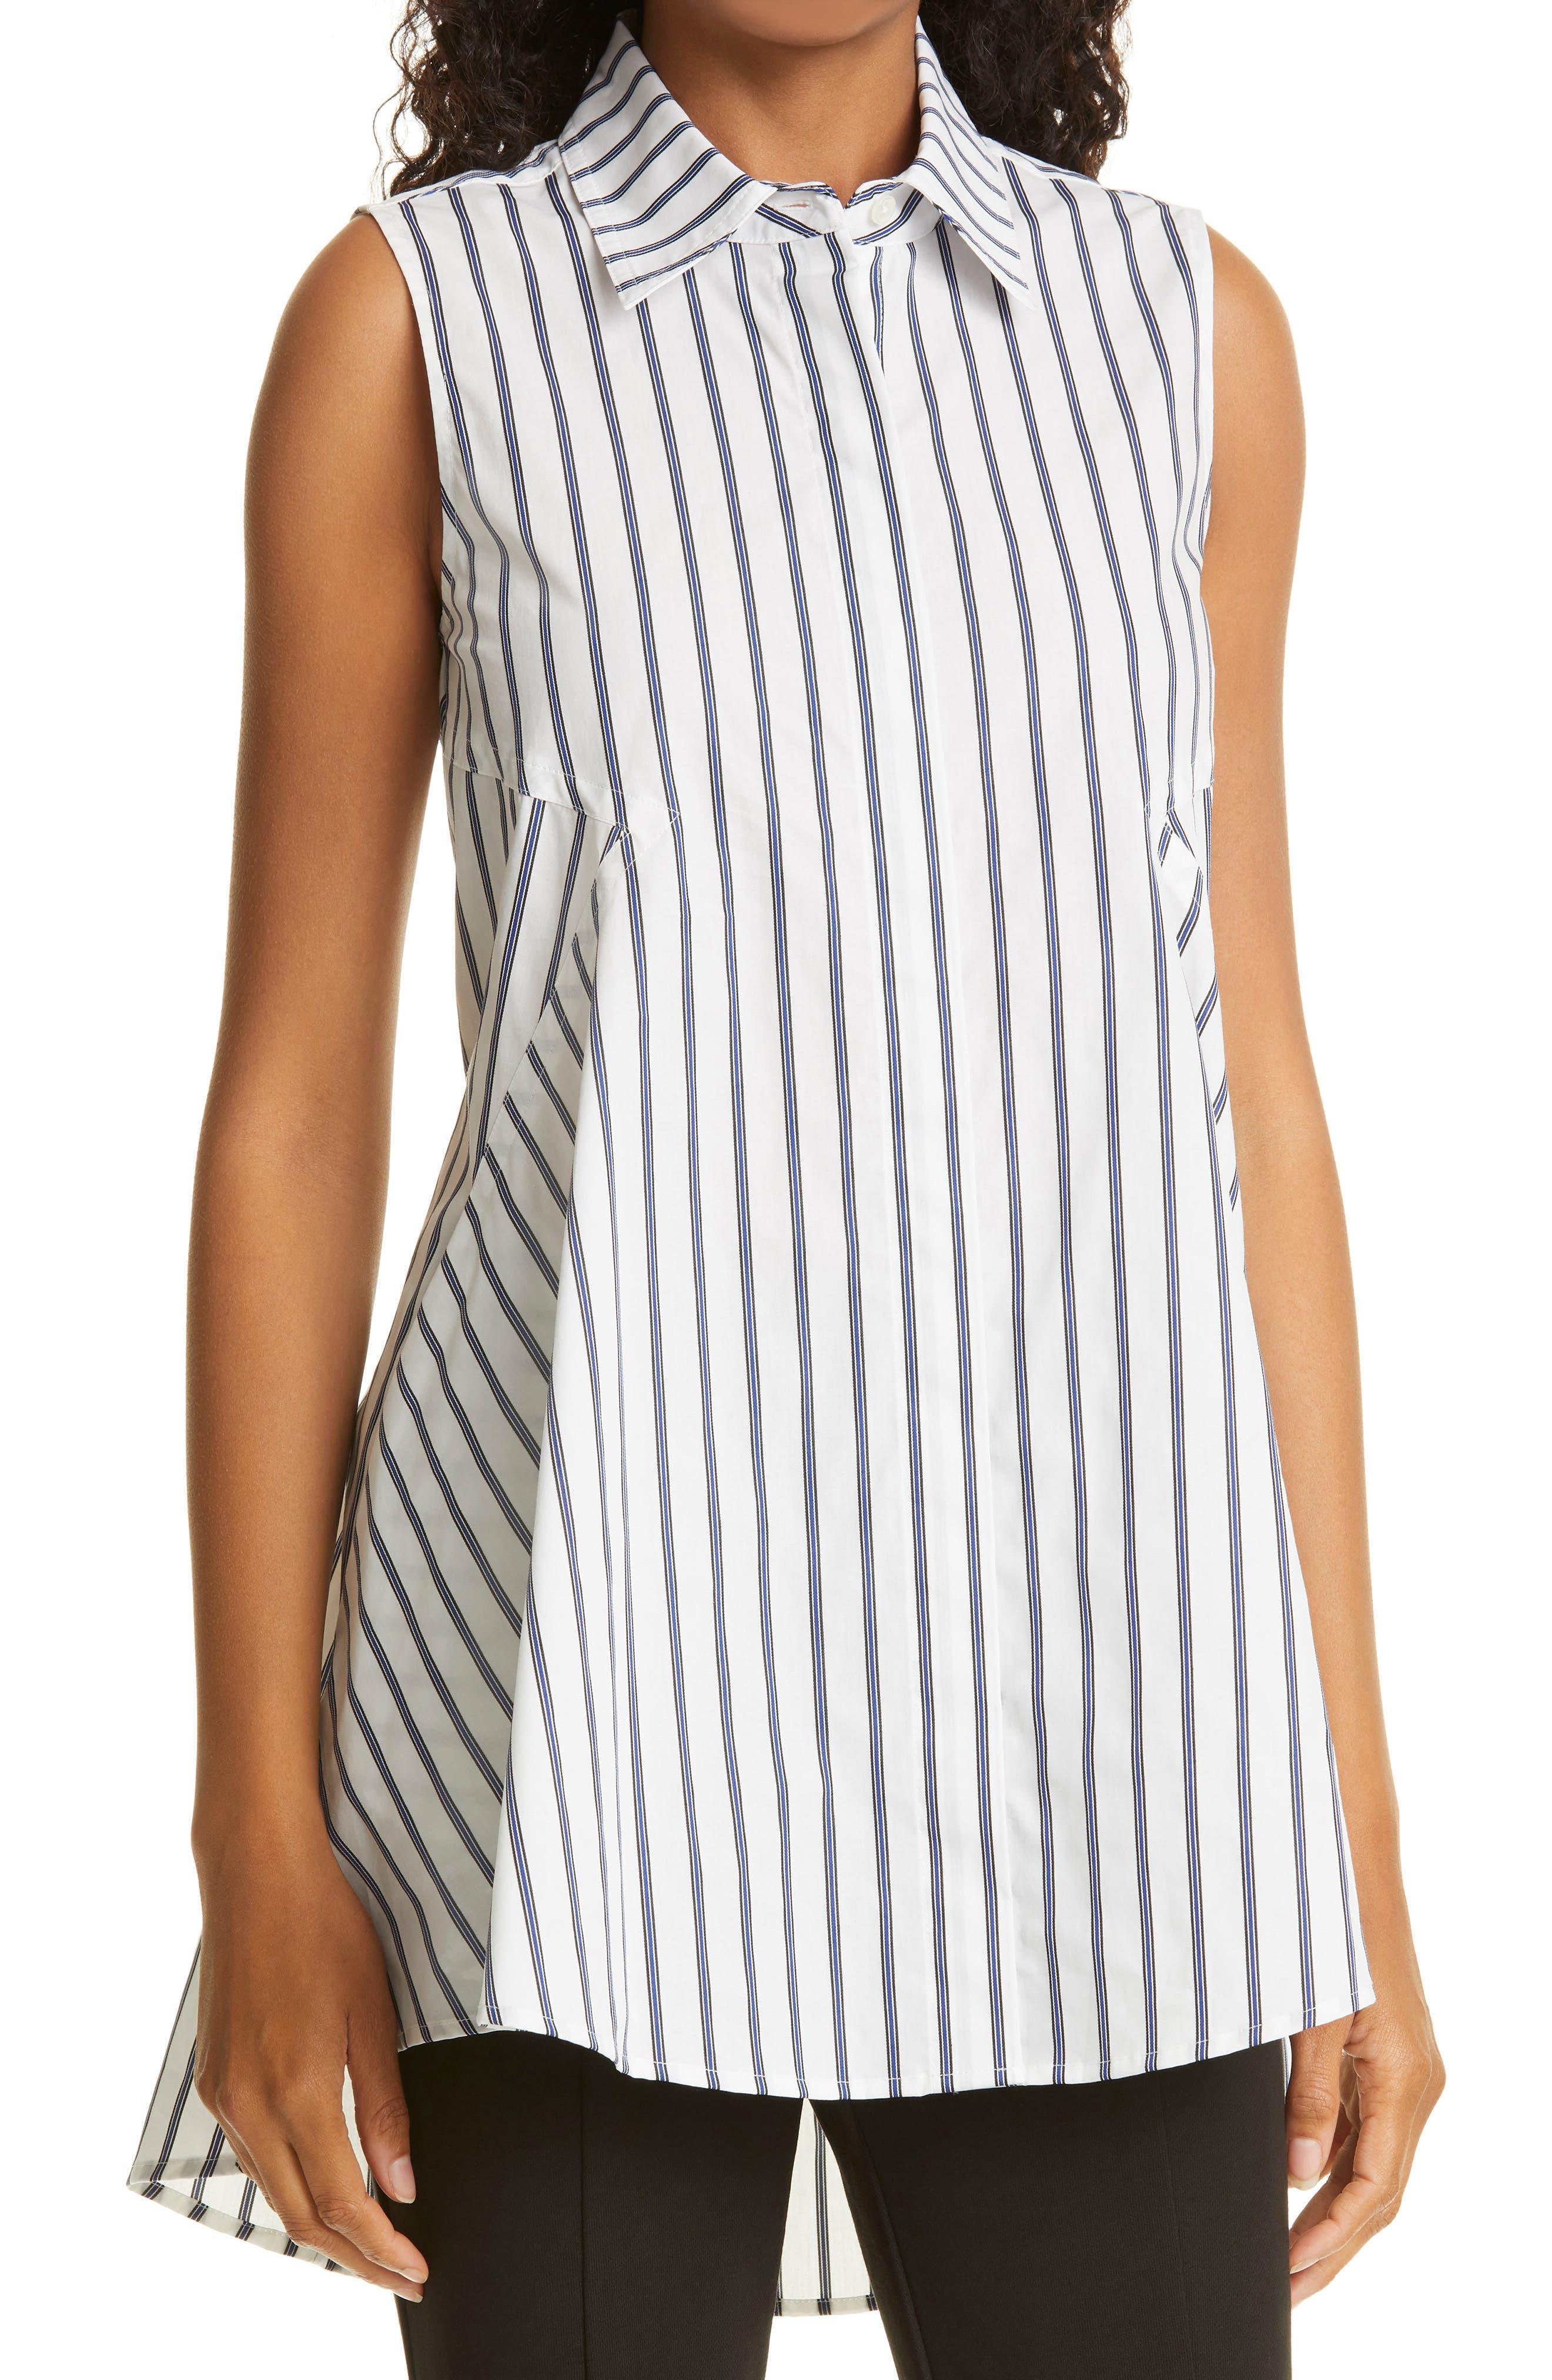 Signature Stripe Sleeveless Tunic